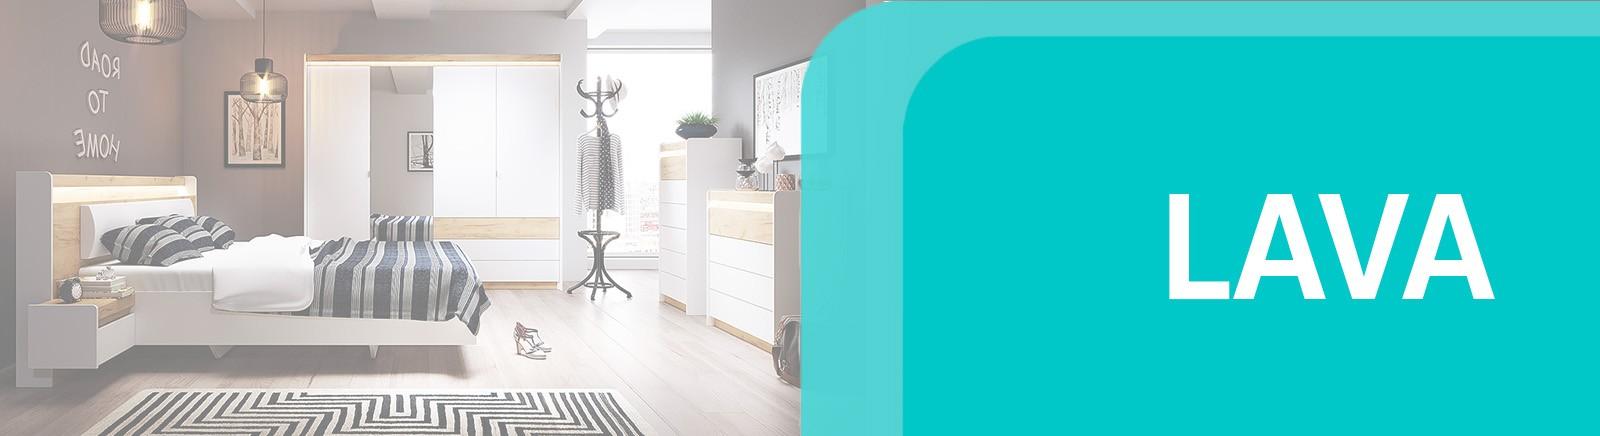 Lava bedroom set